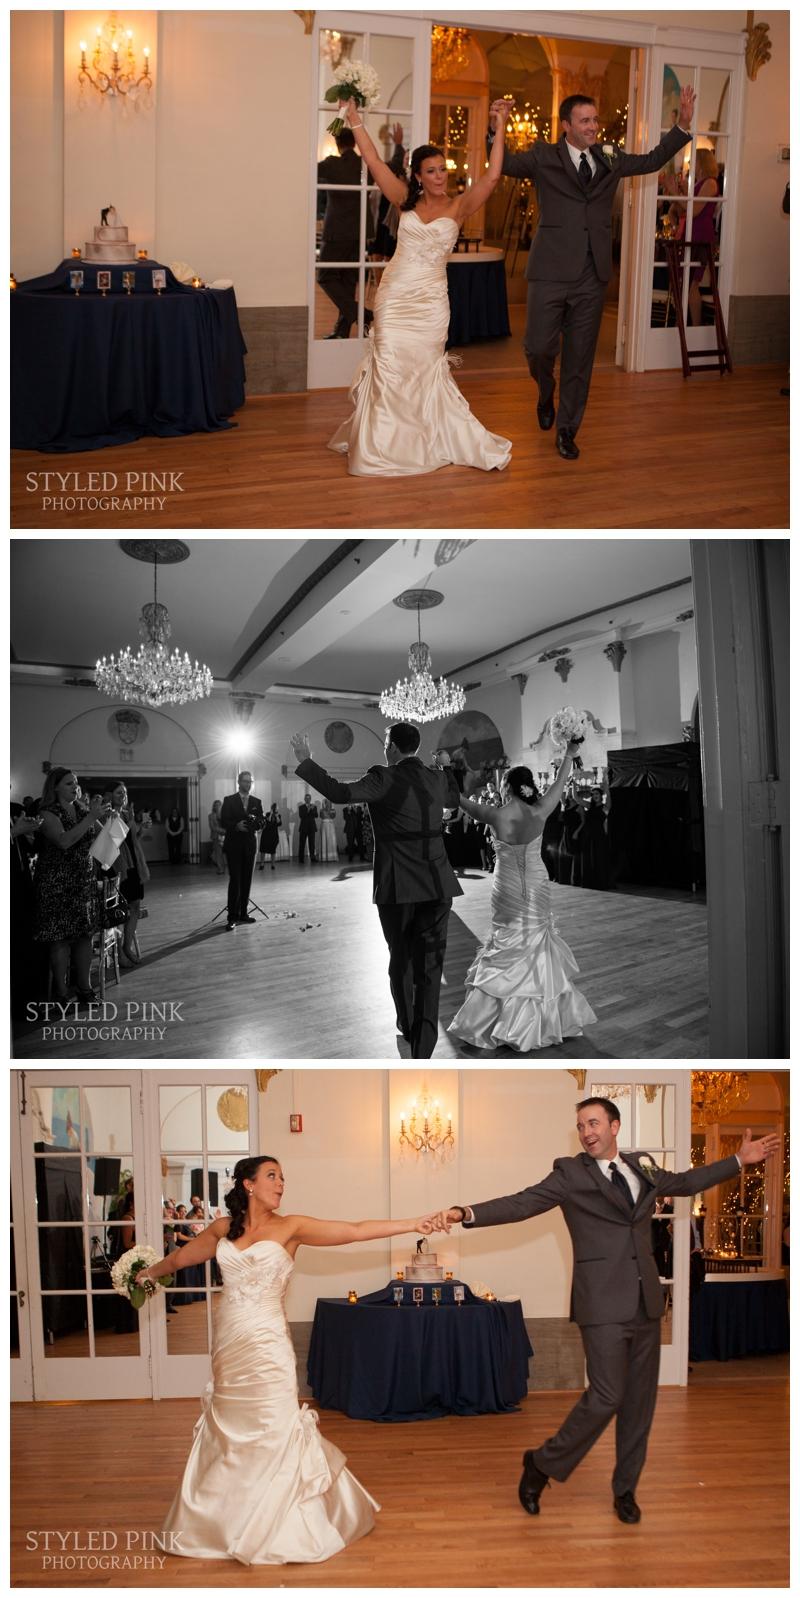 flanders-hotel-wedding-styled-pink-012